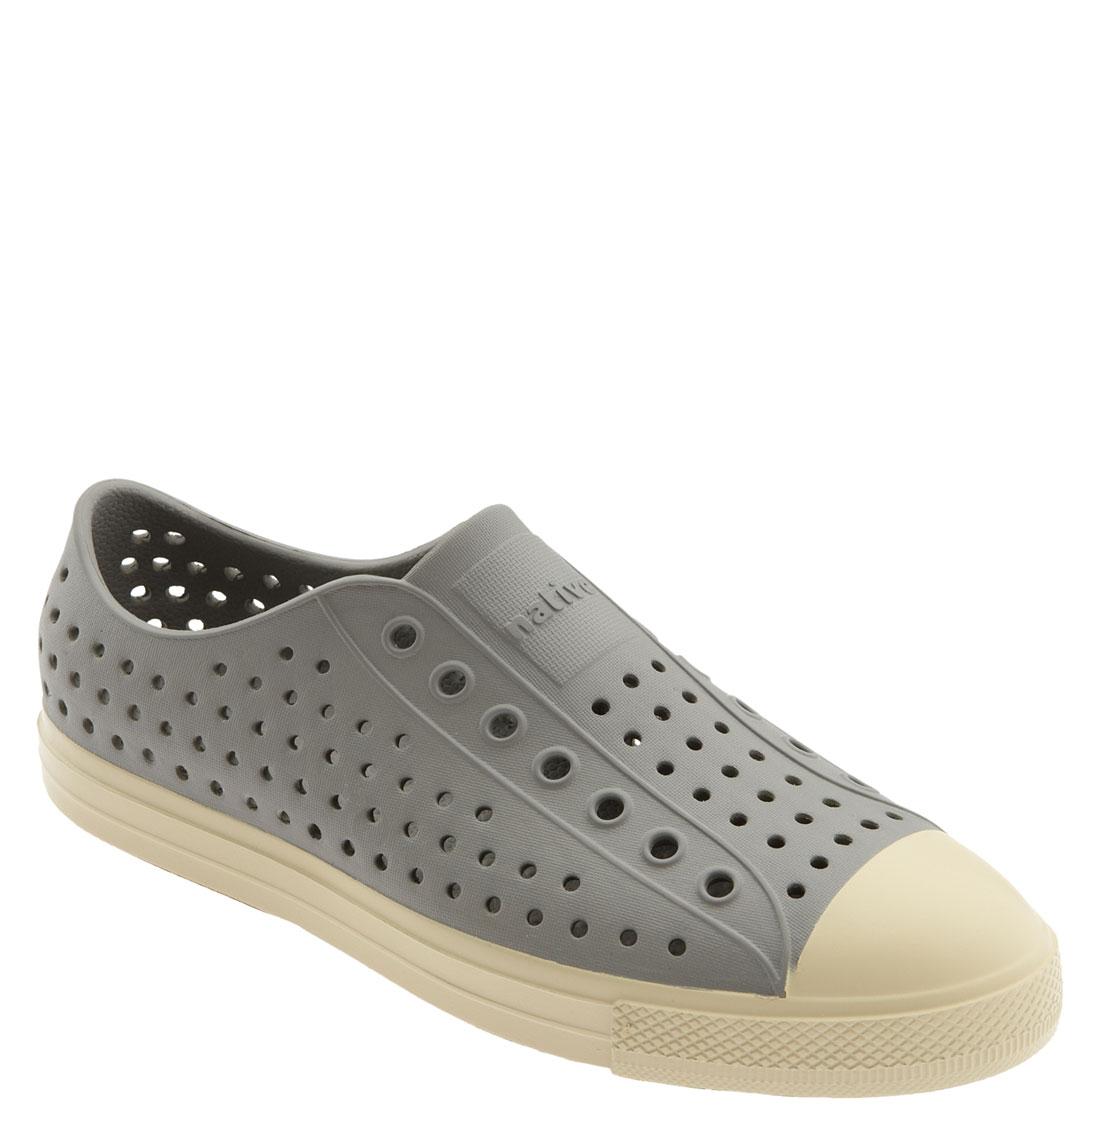 Native Jefferson Shoes Sizing